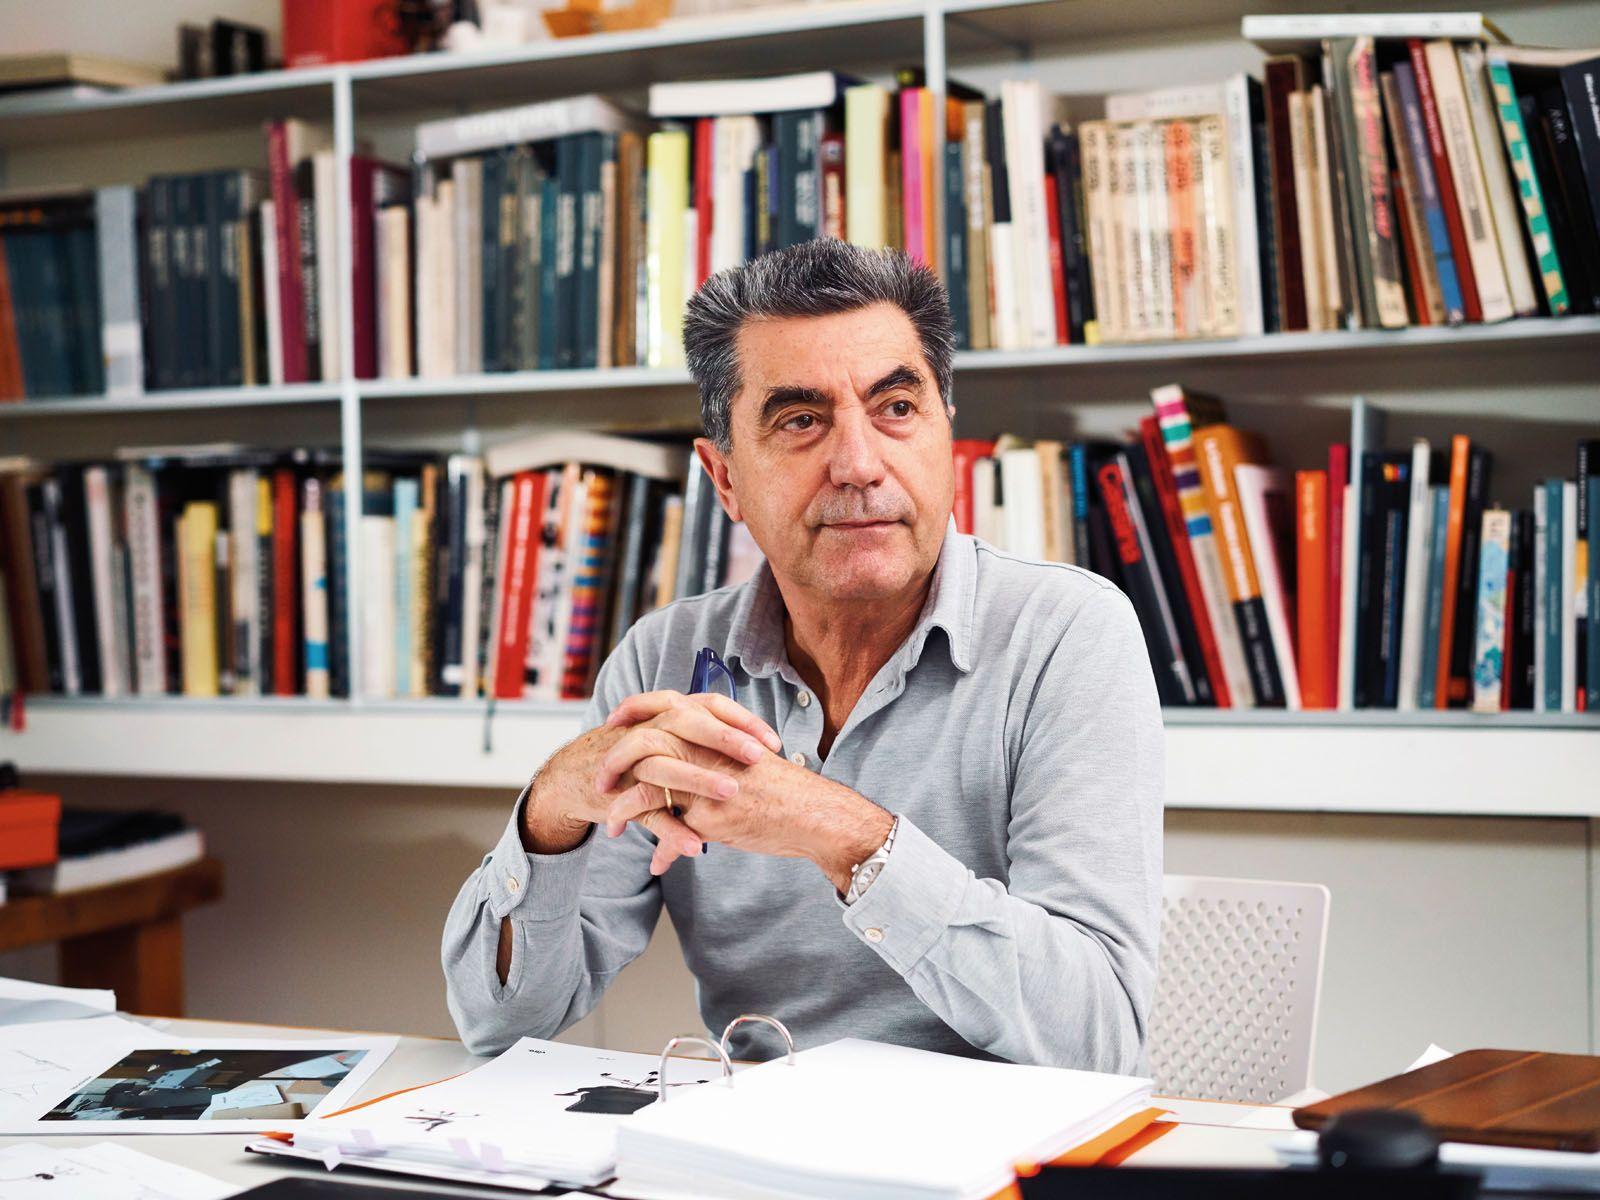 Italian architect Antonio Citterio in his office in Milan